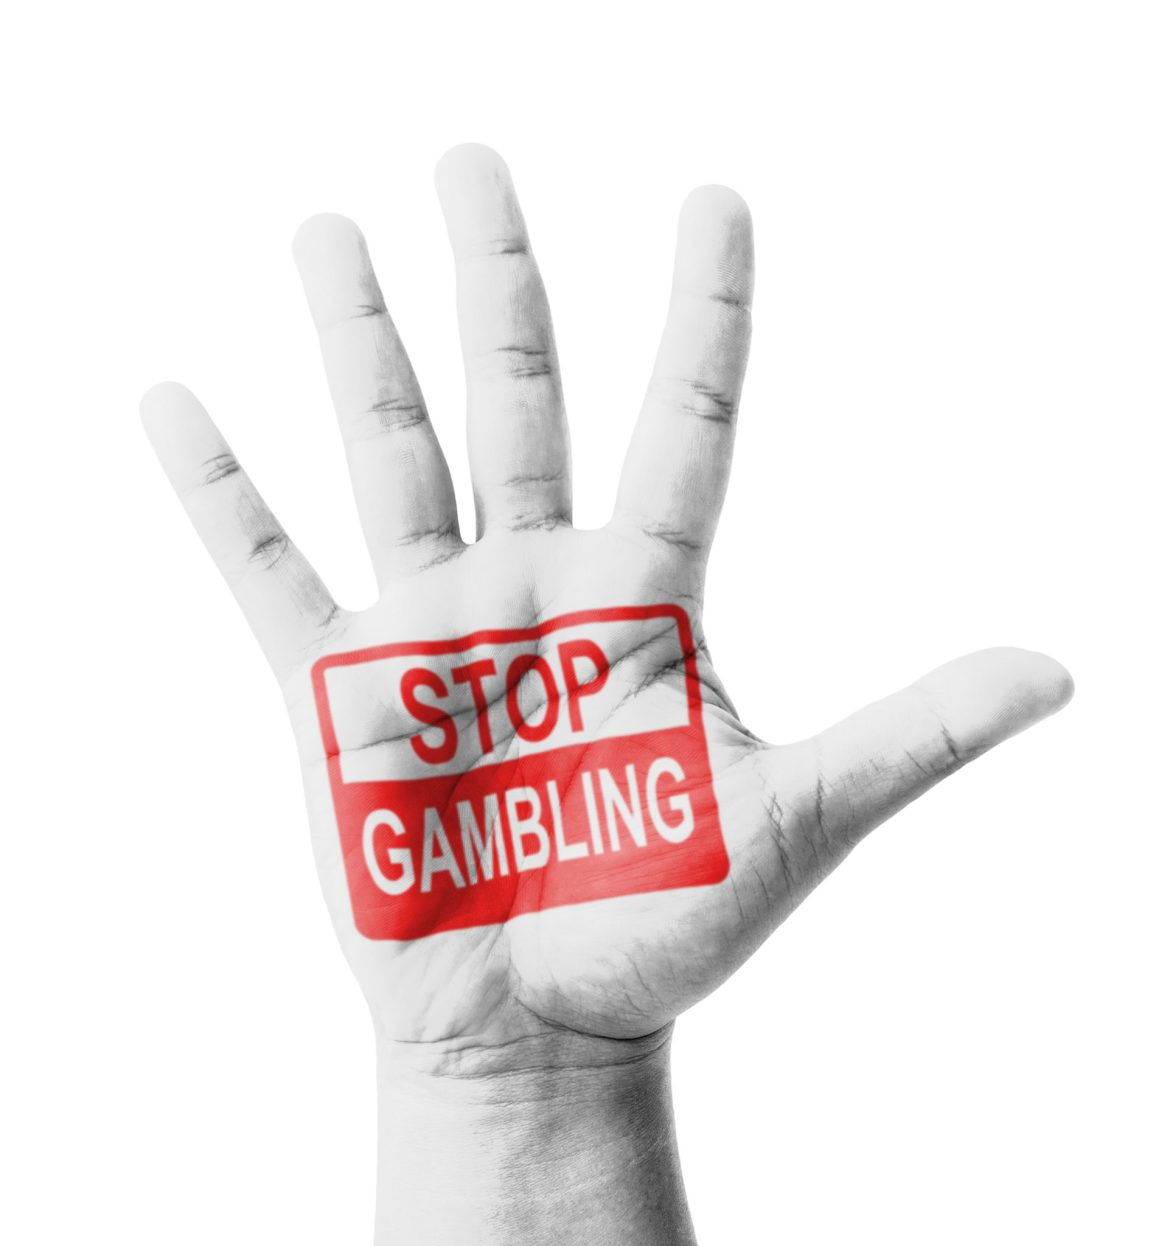 Gambling-addiction-2